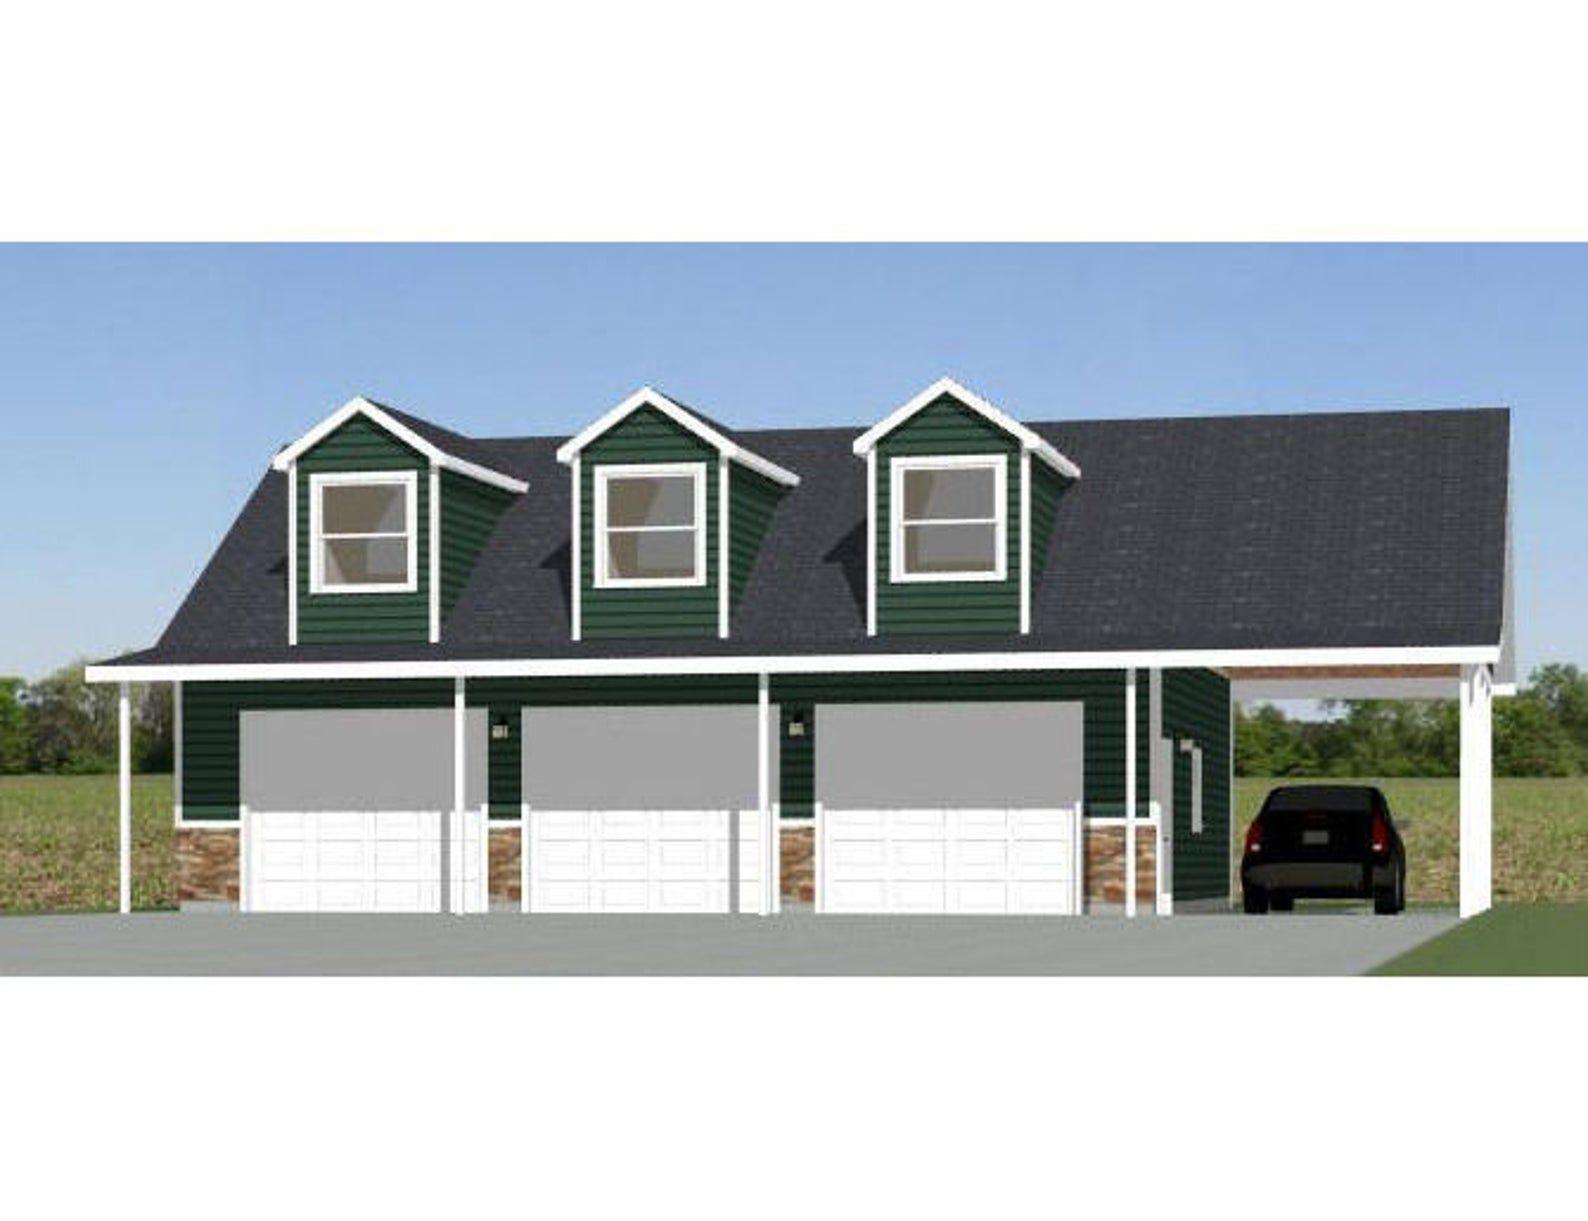 40x30 3 Car Garage 1 894 sq ft PDF Floor Plan Instant Download Model 10